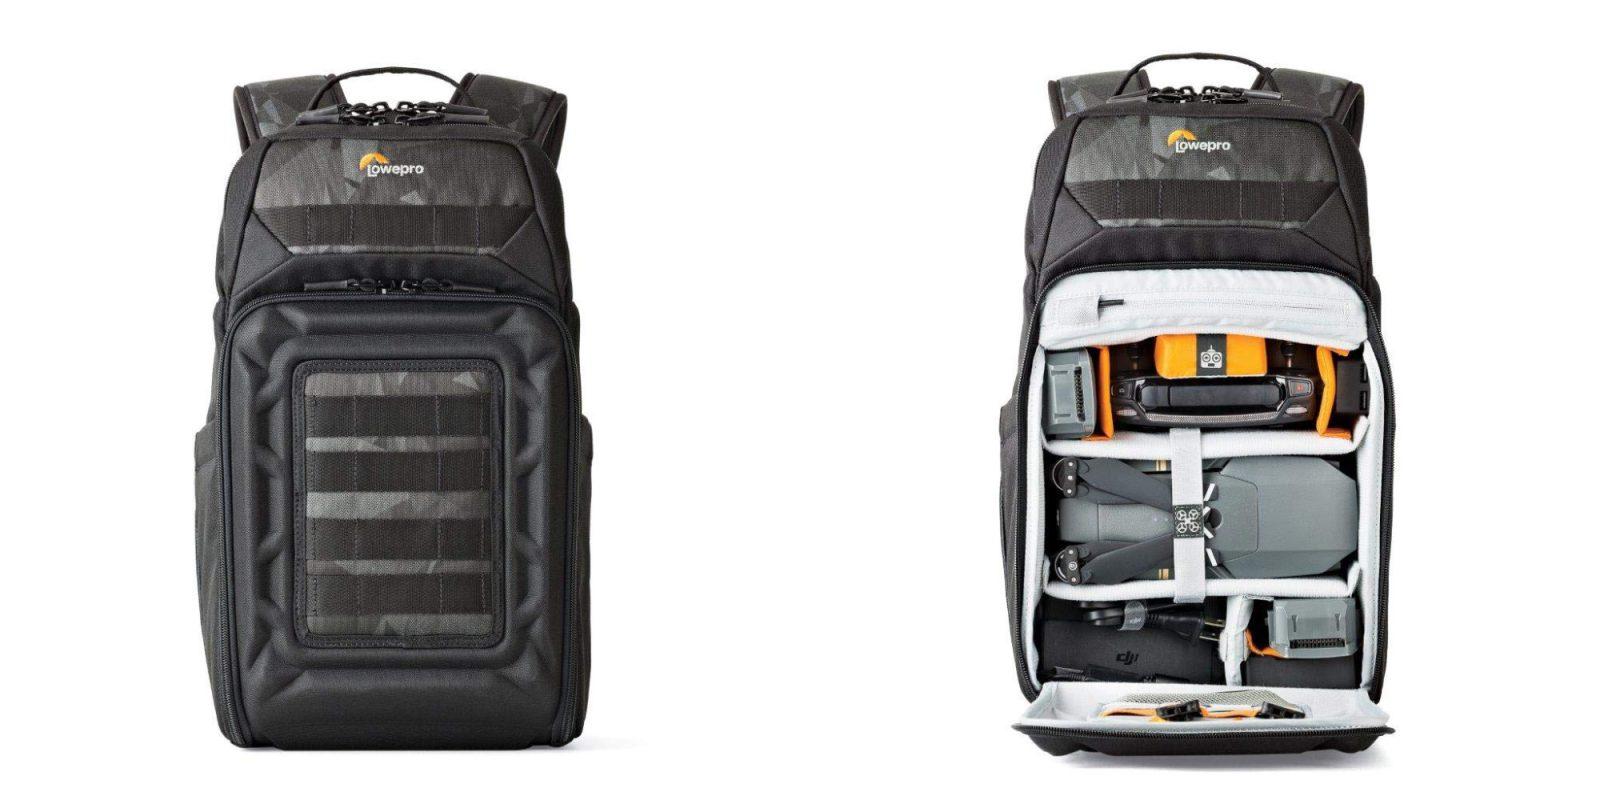 The Lowepro DroneGuard Backpack will properly tote DJI's Mavic: $35 (Reg. $60)